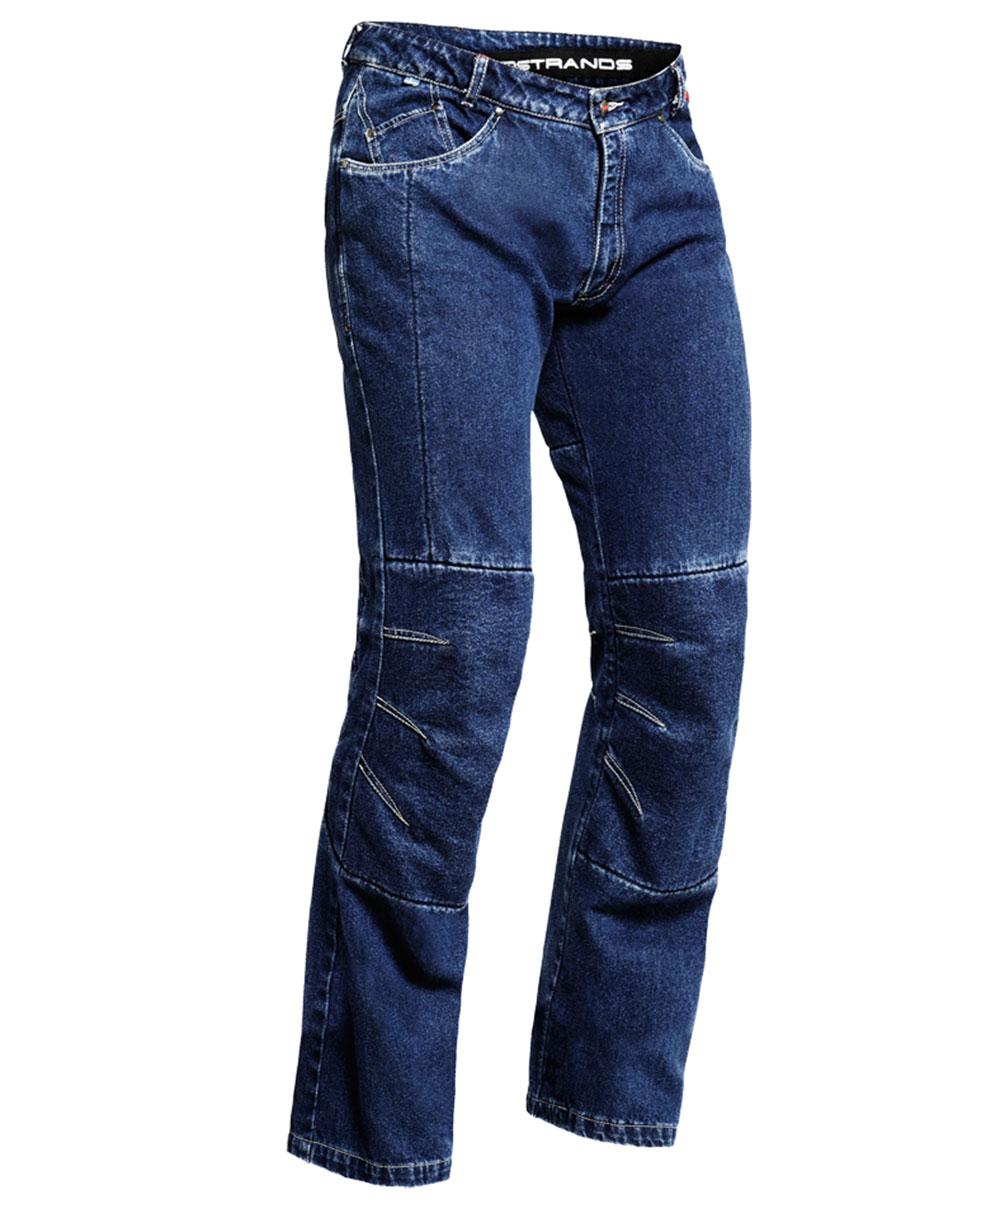 Lindstrands housse bleu moto pantalon jeans jambe courte for Housse a costume